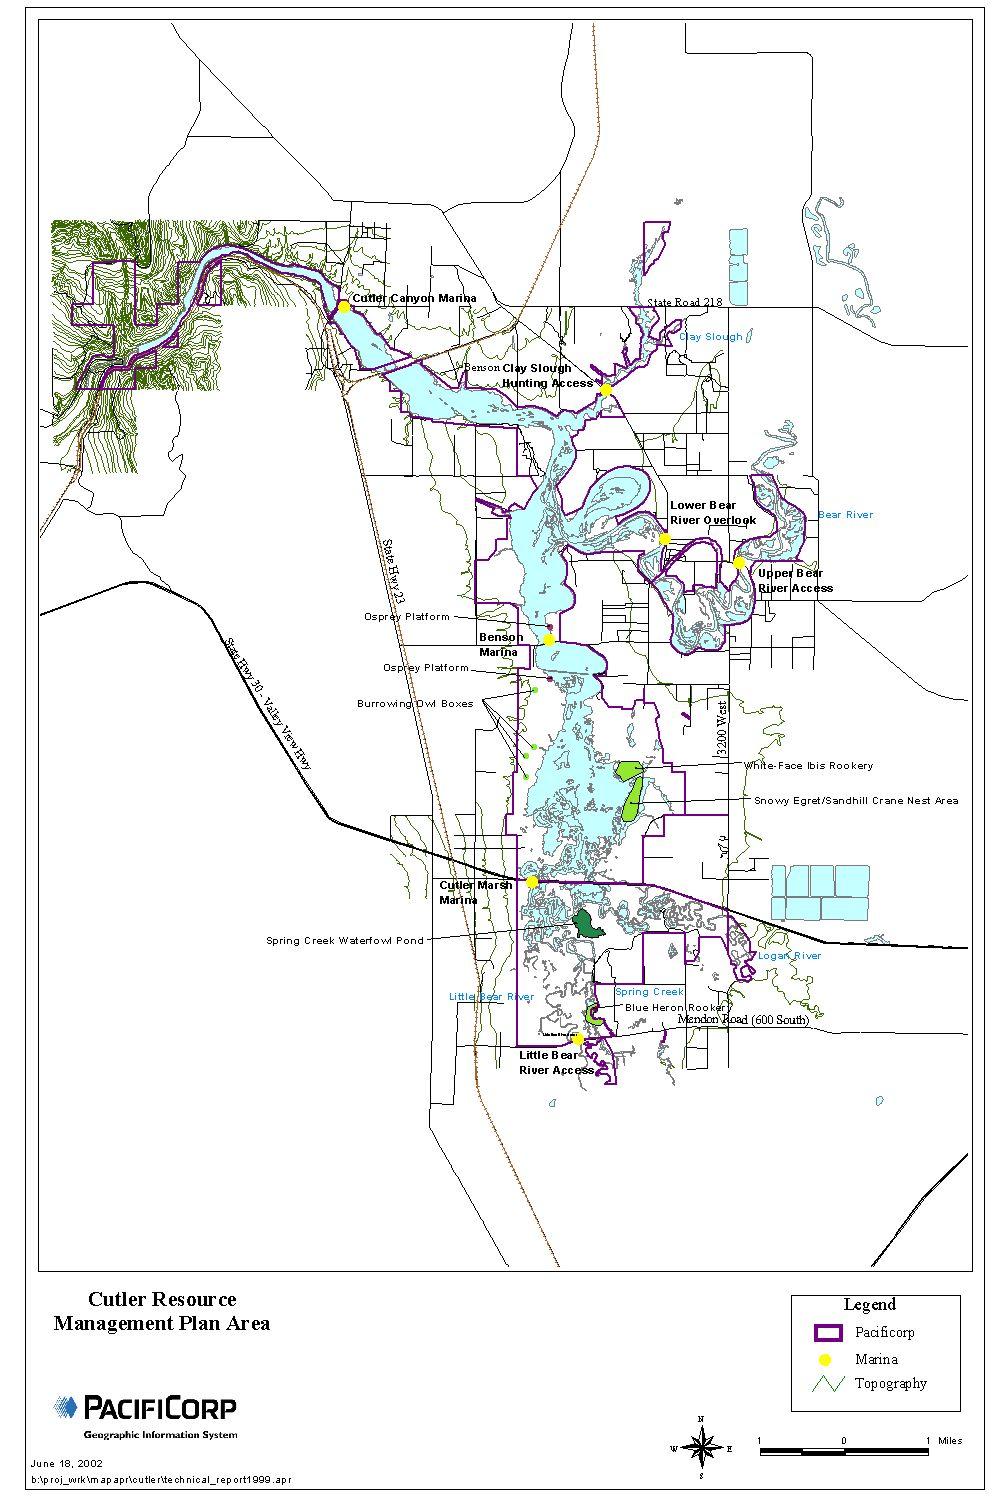 Cutler Reservoir Management Plan Area PacifiCorp GIS, June 18, 2002